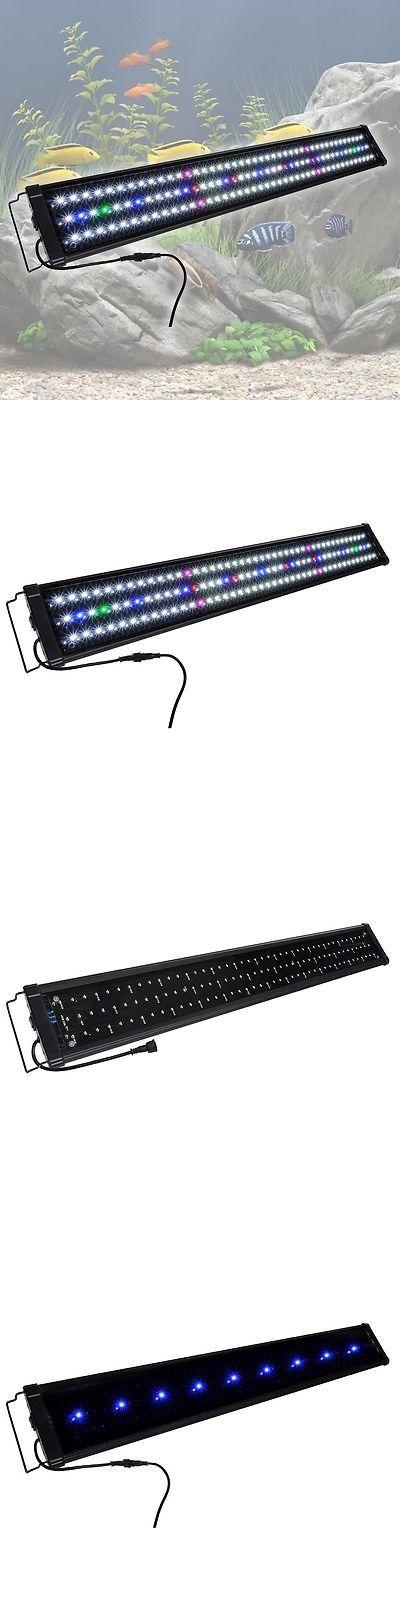 Animals Fish And Aquariums: New 129 Multi-Color Led Aquarium Light Full Spectrum Lamp For 36-43 Fish Tank BUY IT NOW ONLY: $36.9